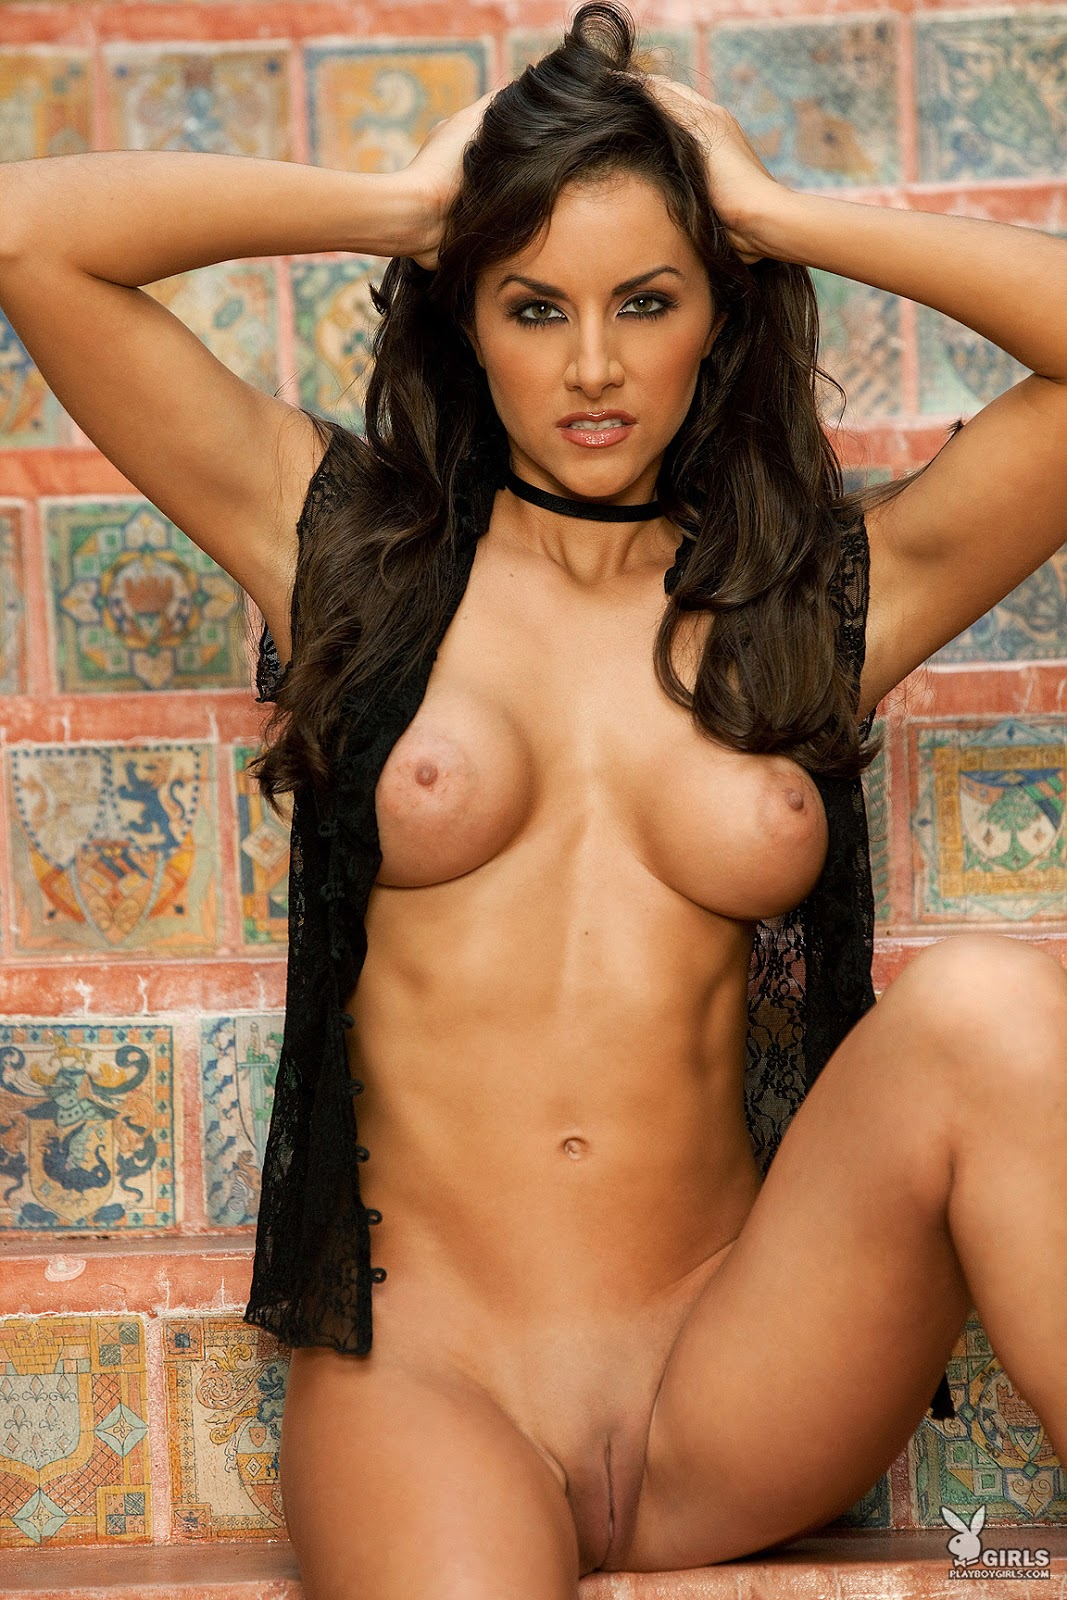 x ART x MODELS x: Playboy Busty Babes - Rebecca Lynn Nude ...